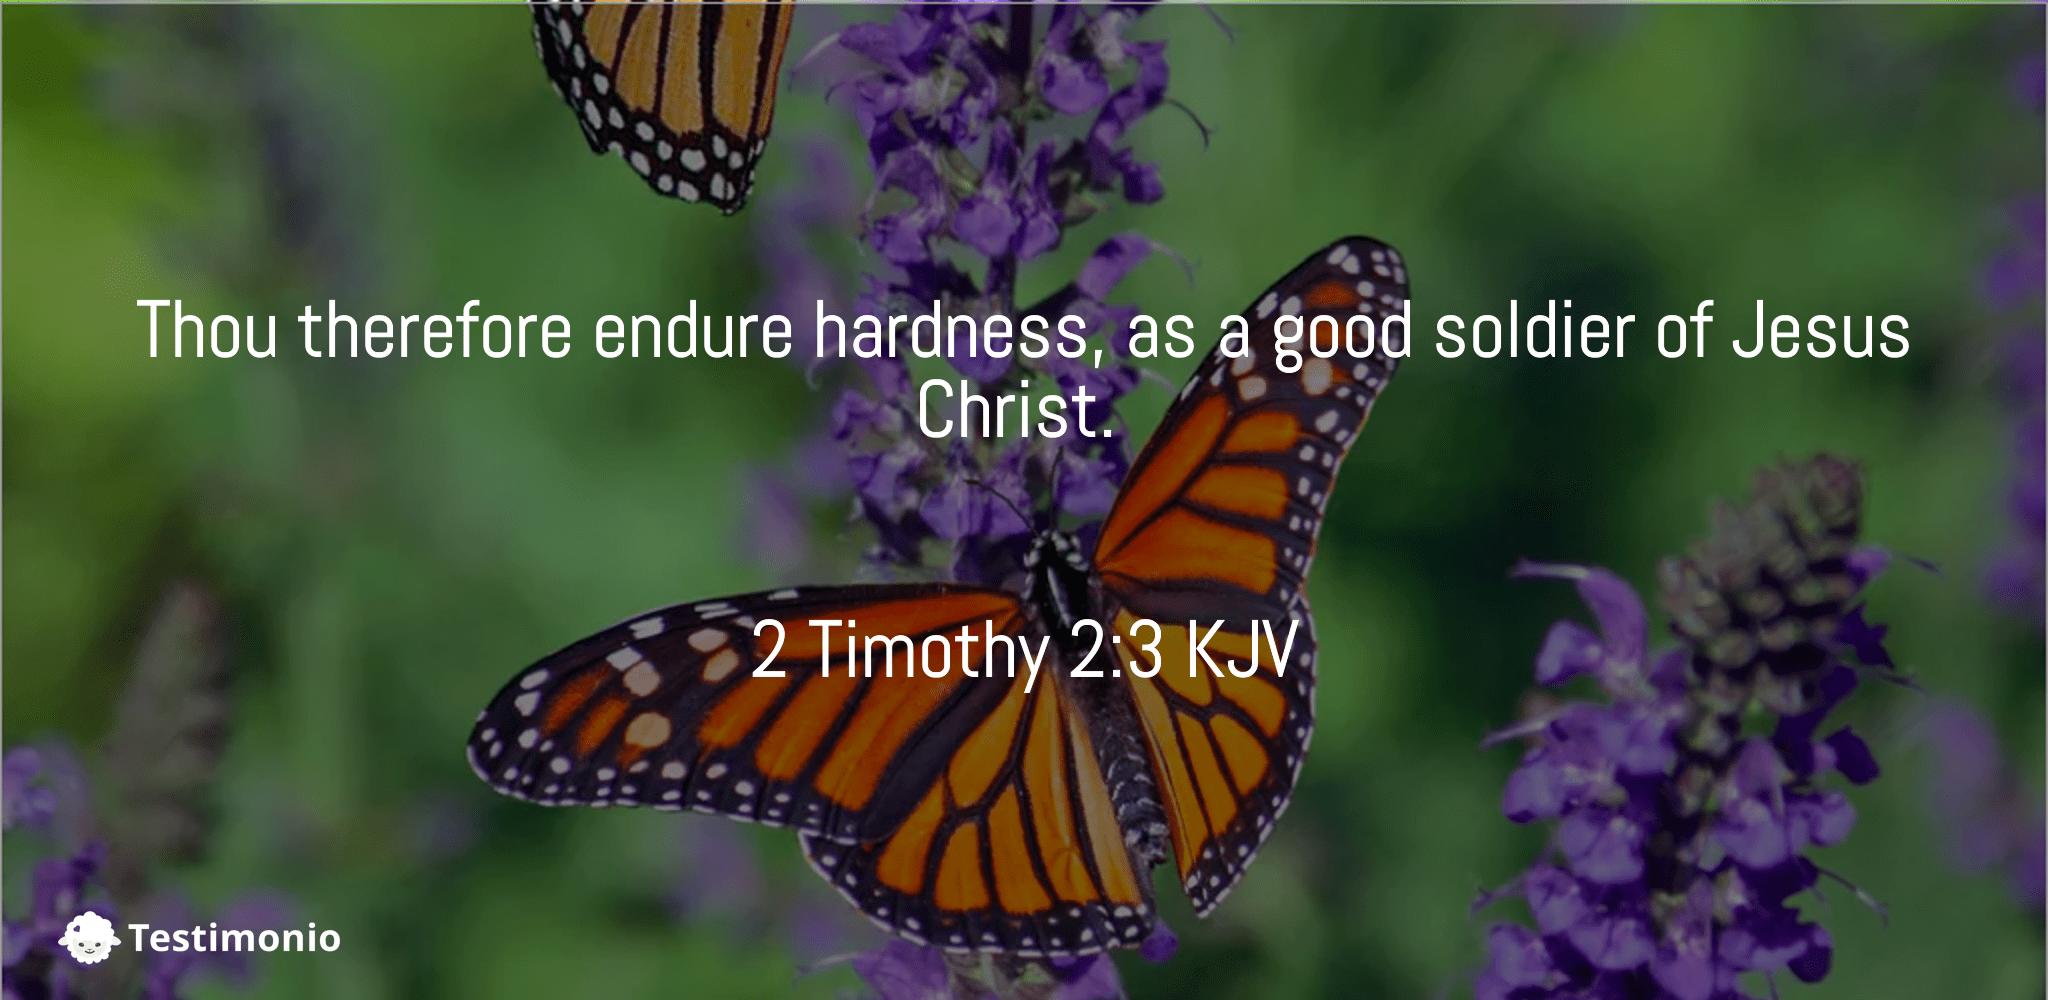 2 Timothy 2:3